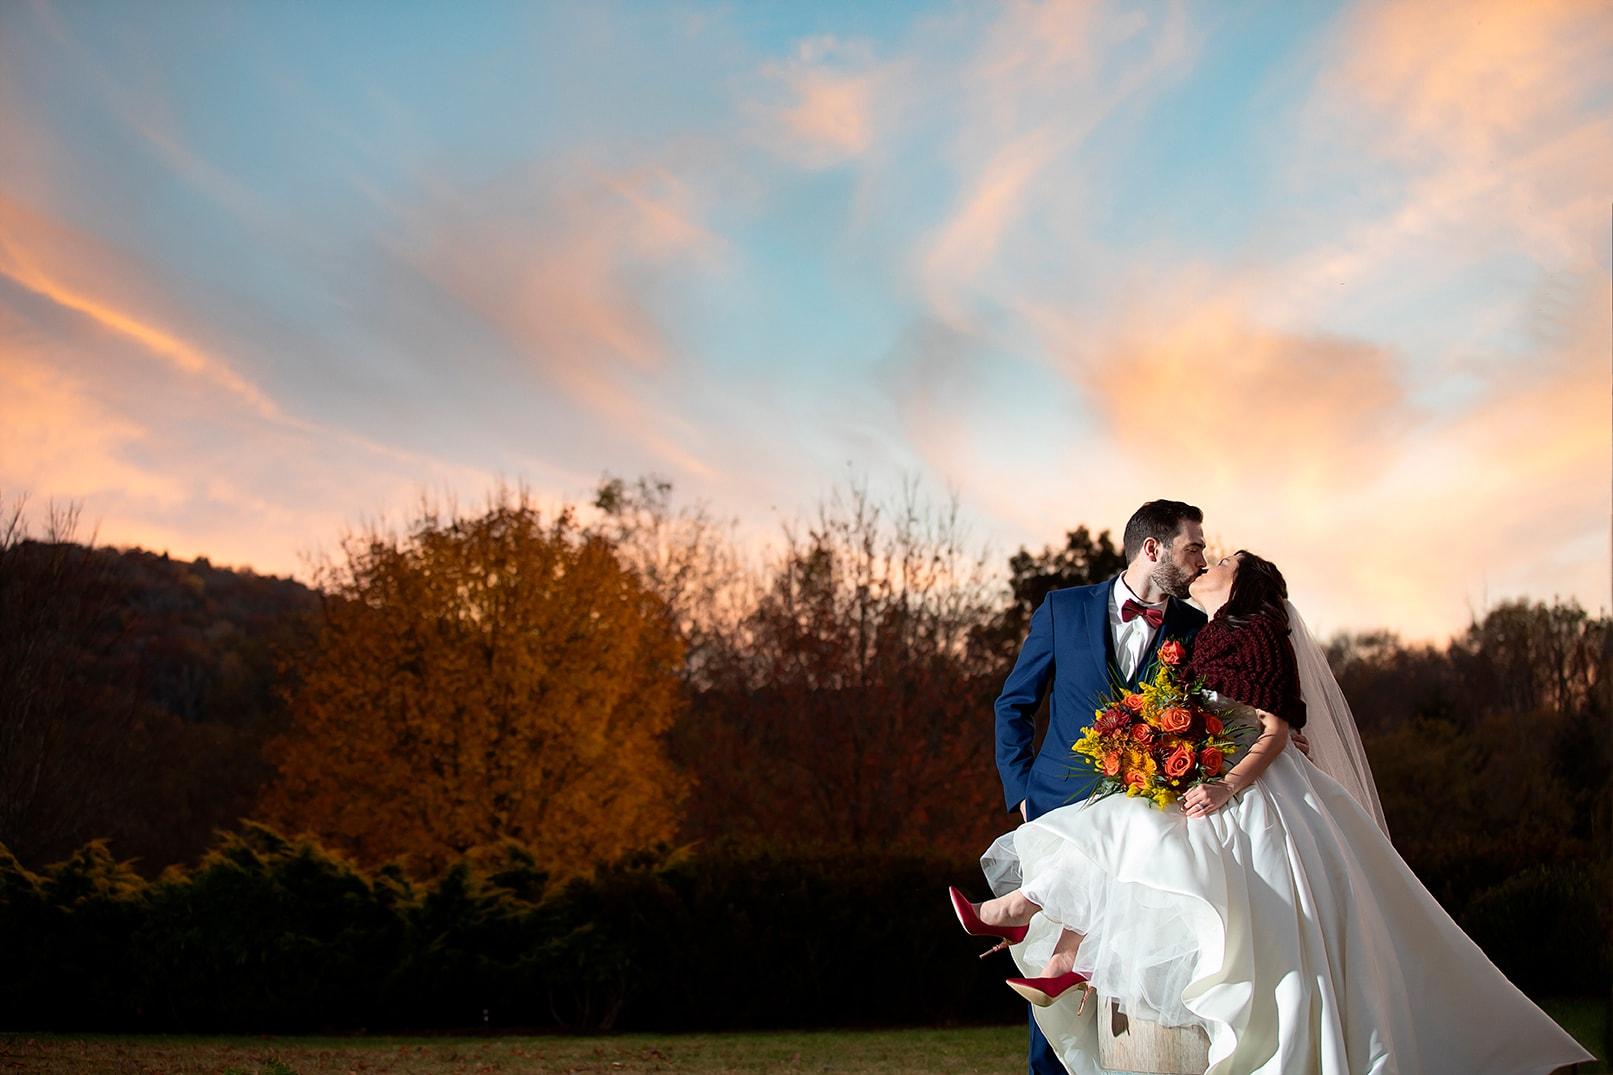 banner elk winery elopement intimate wedding sunset